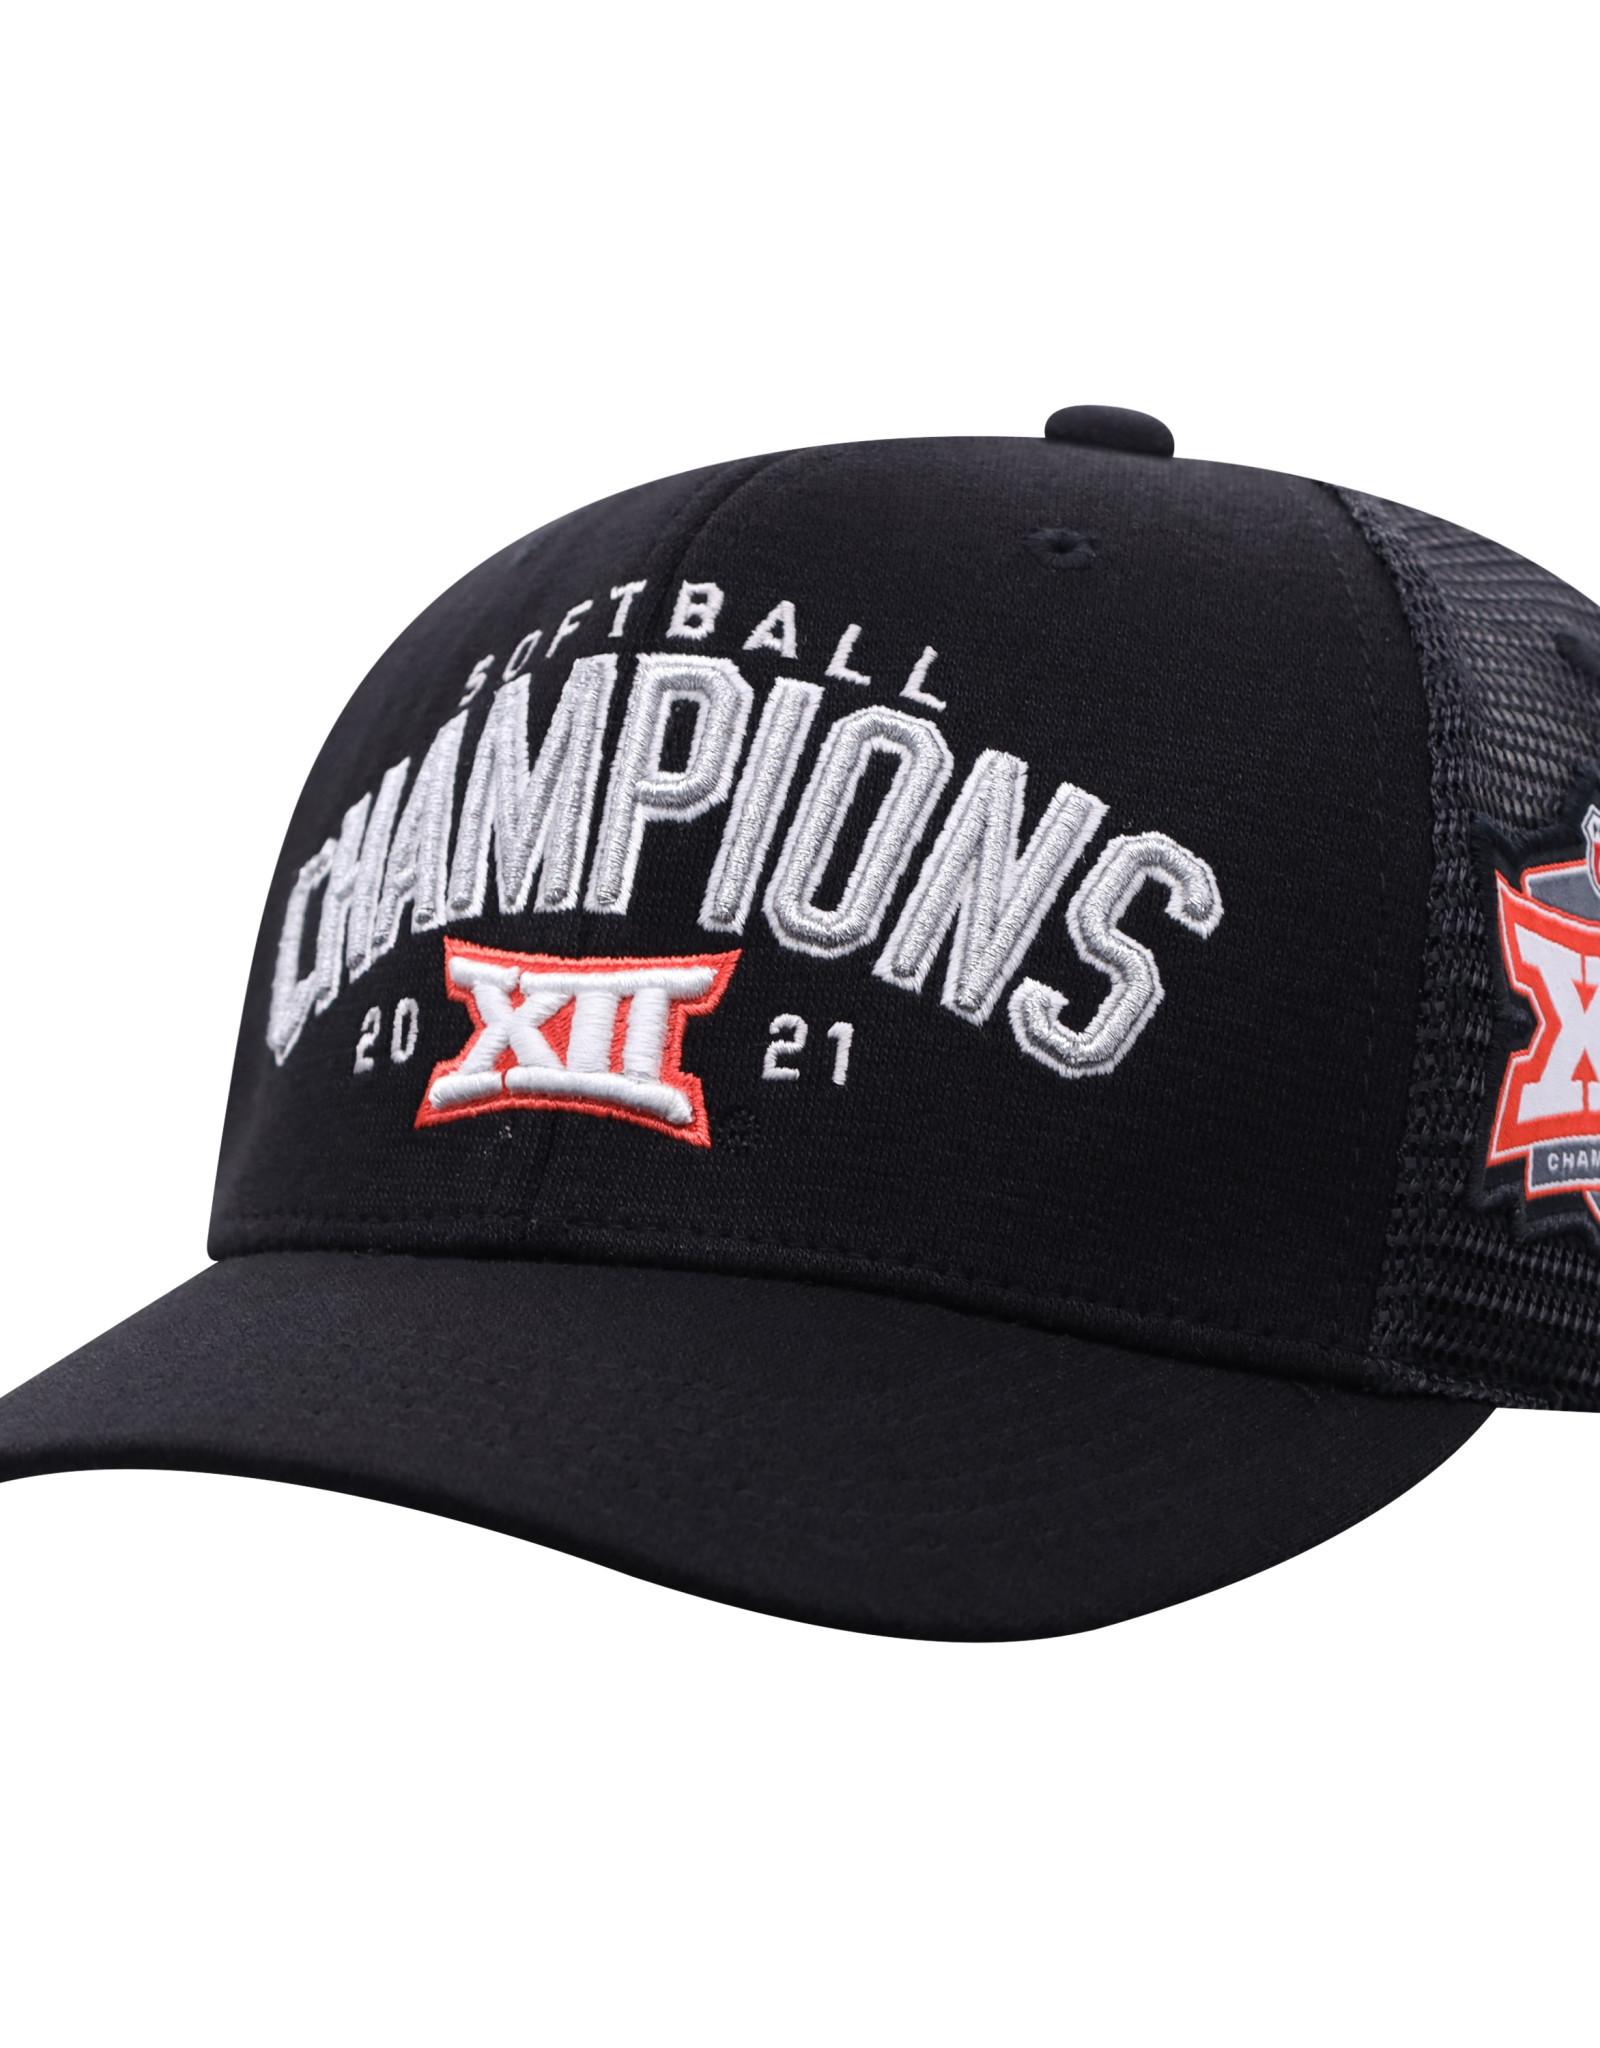 TOW Big XII Softball Locker Room Hat 2021